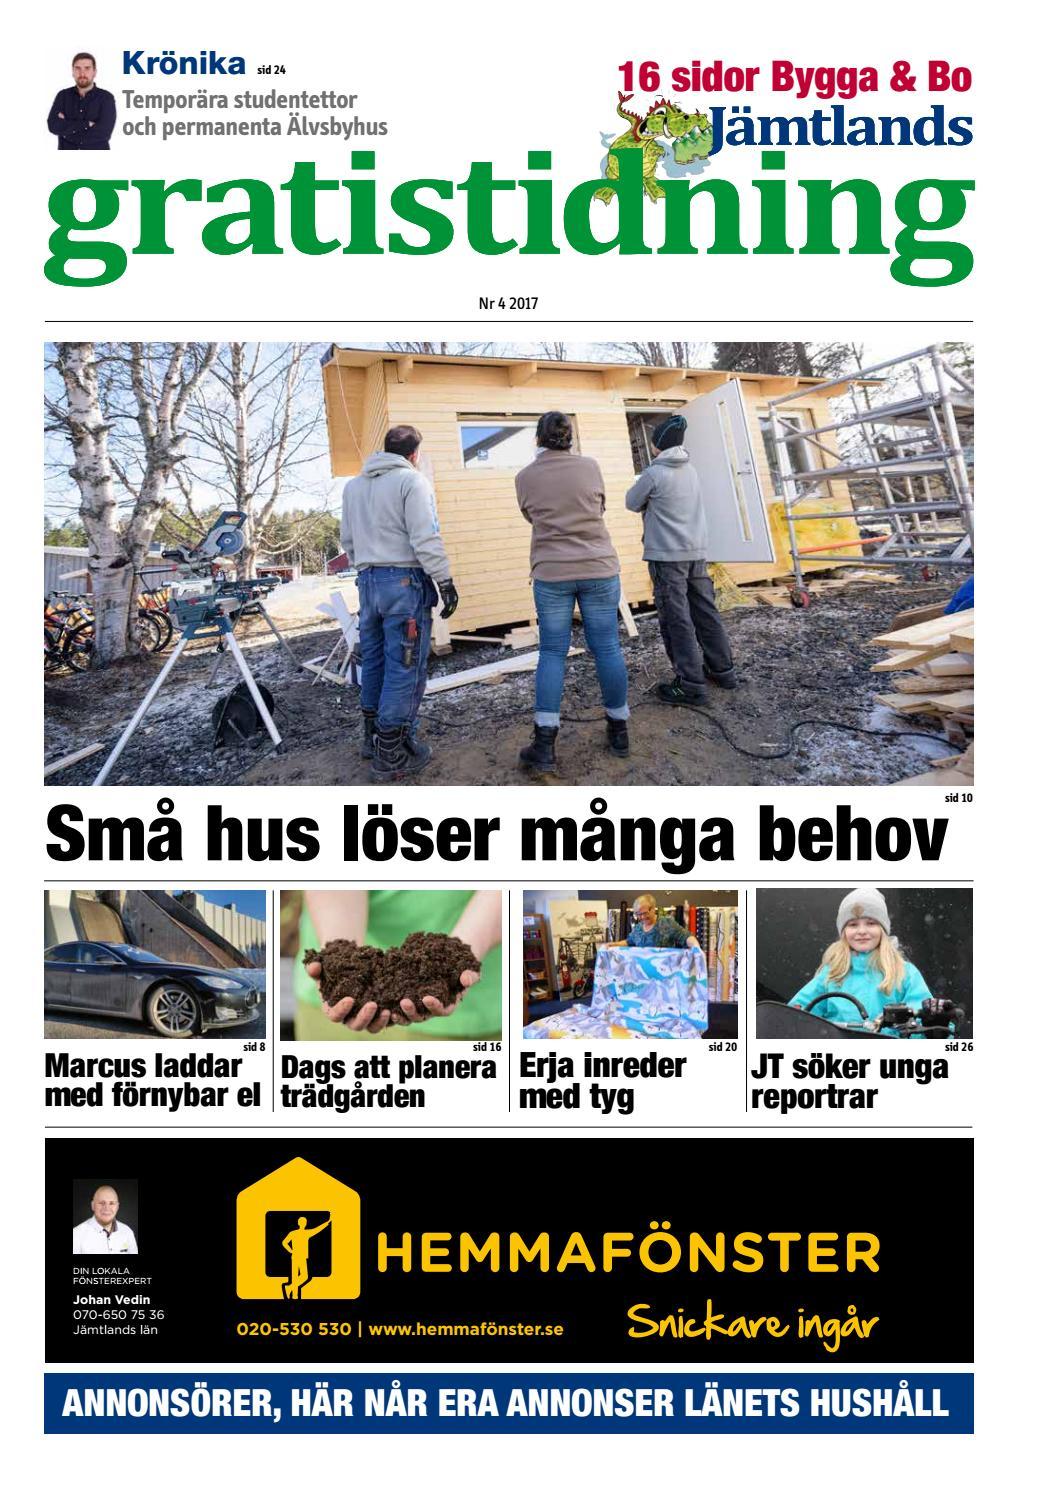 Ntdejting Jmtland, Trffa Singlar Visby